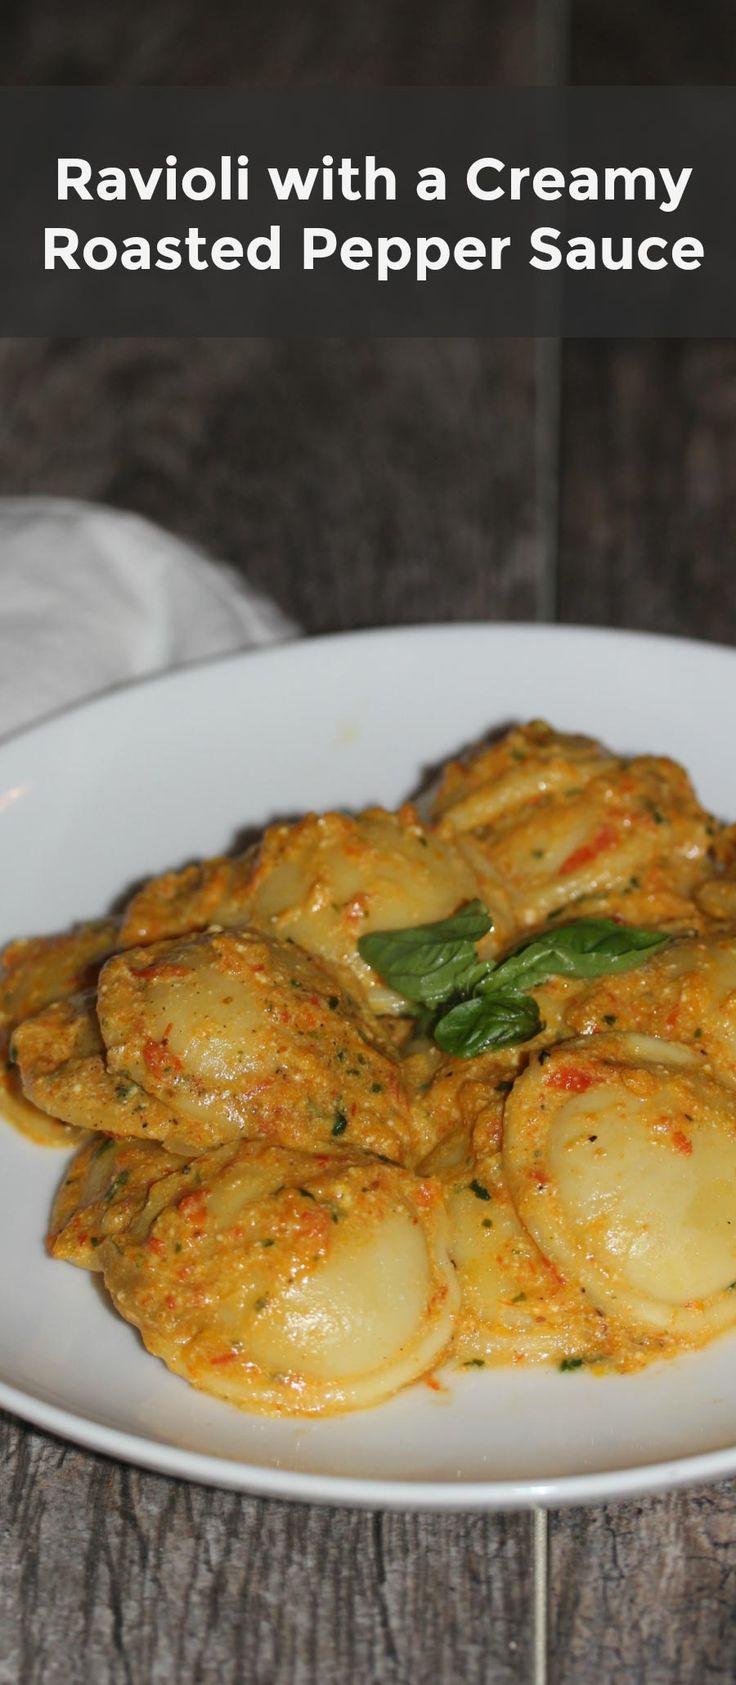 Ravioli with Creamy Roasted Pepper Sauce